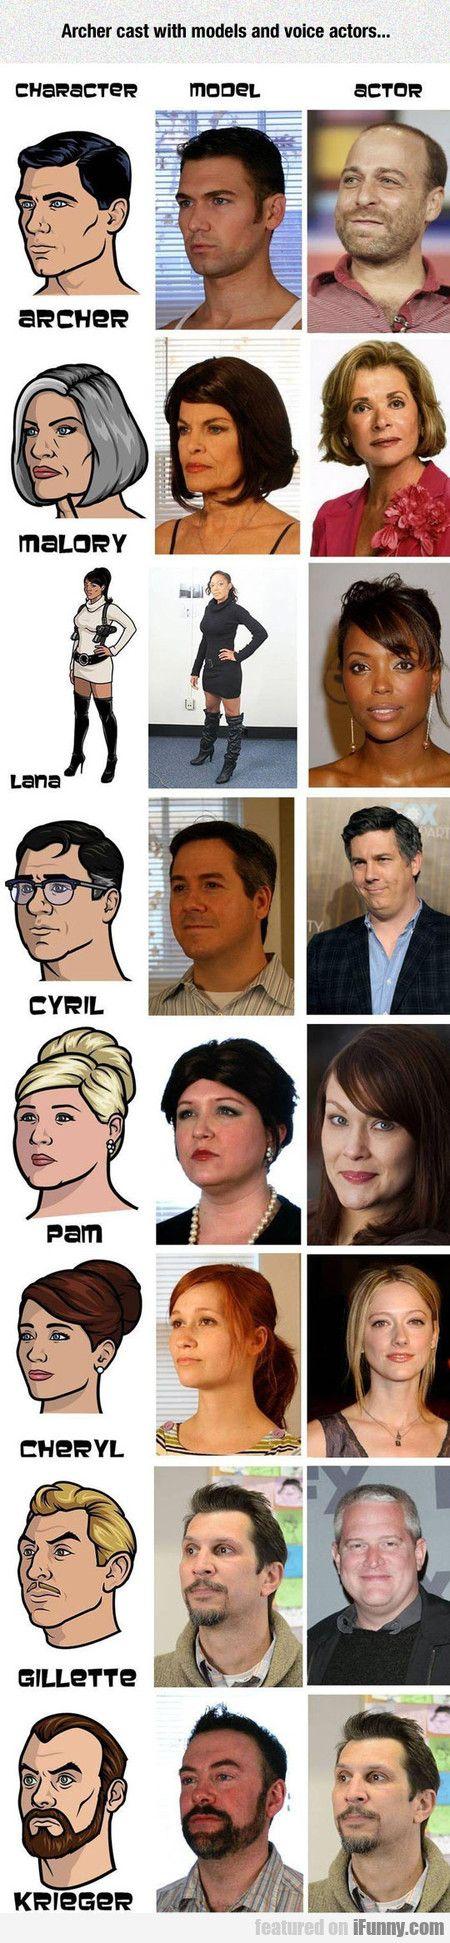 Archer Cast With Models And Voice Actors...